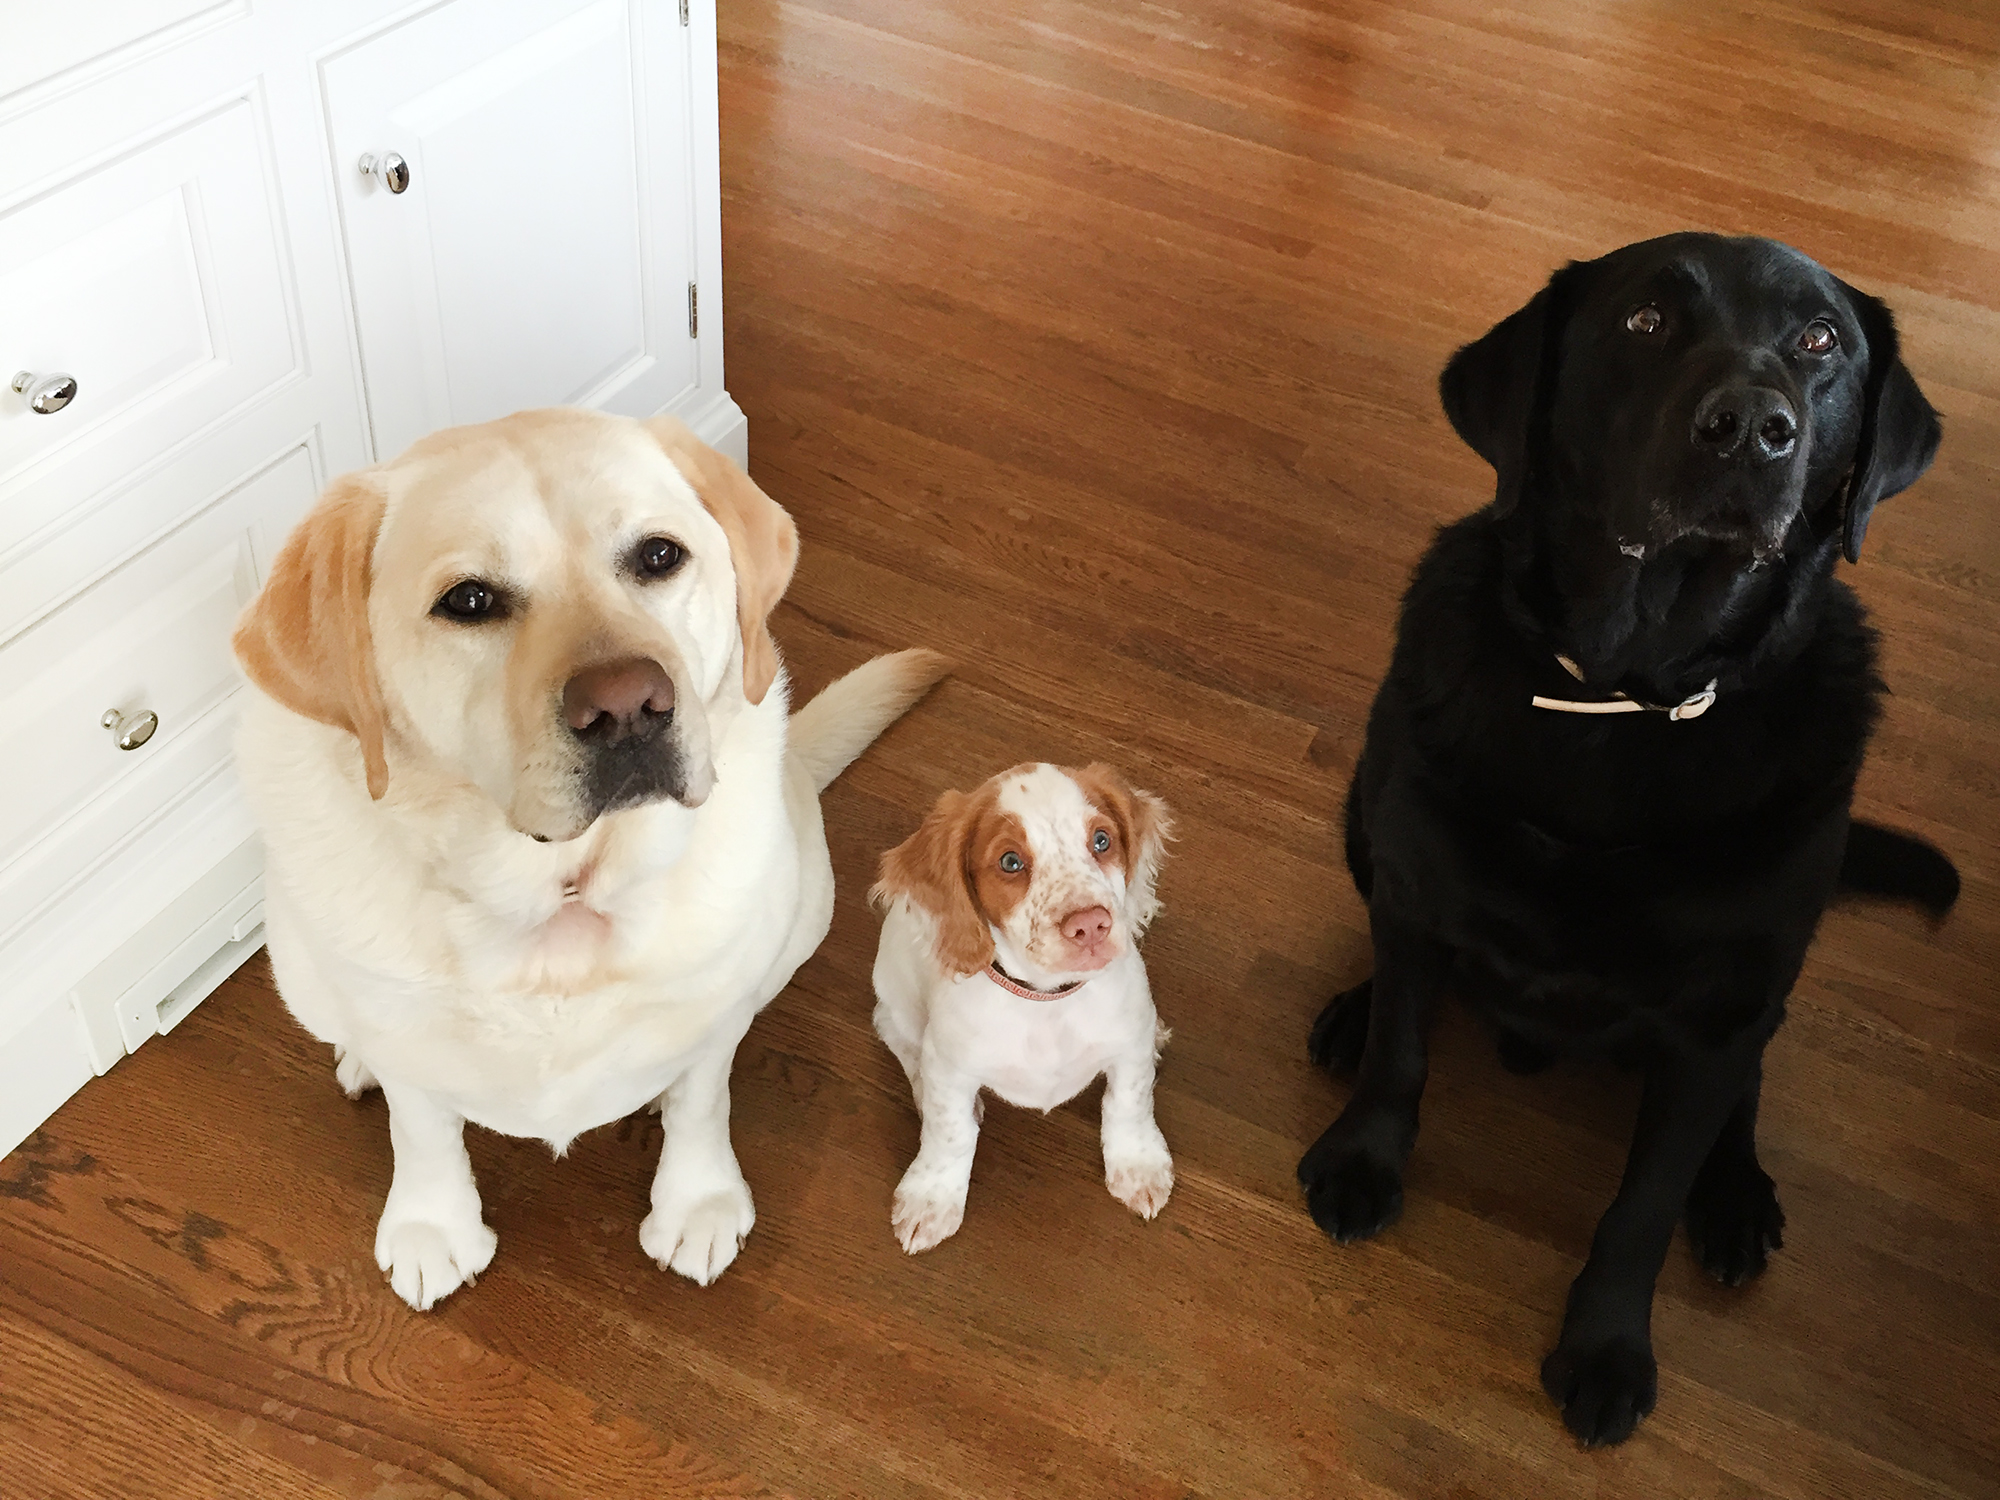 Neely's Nest – Pet Home Goods